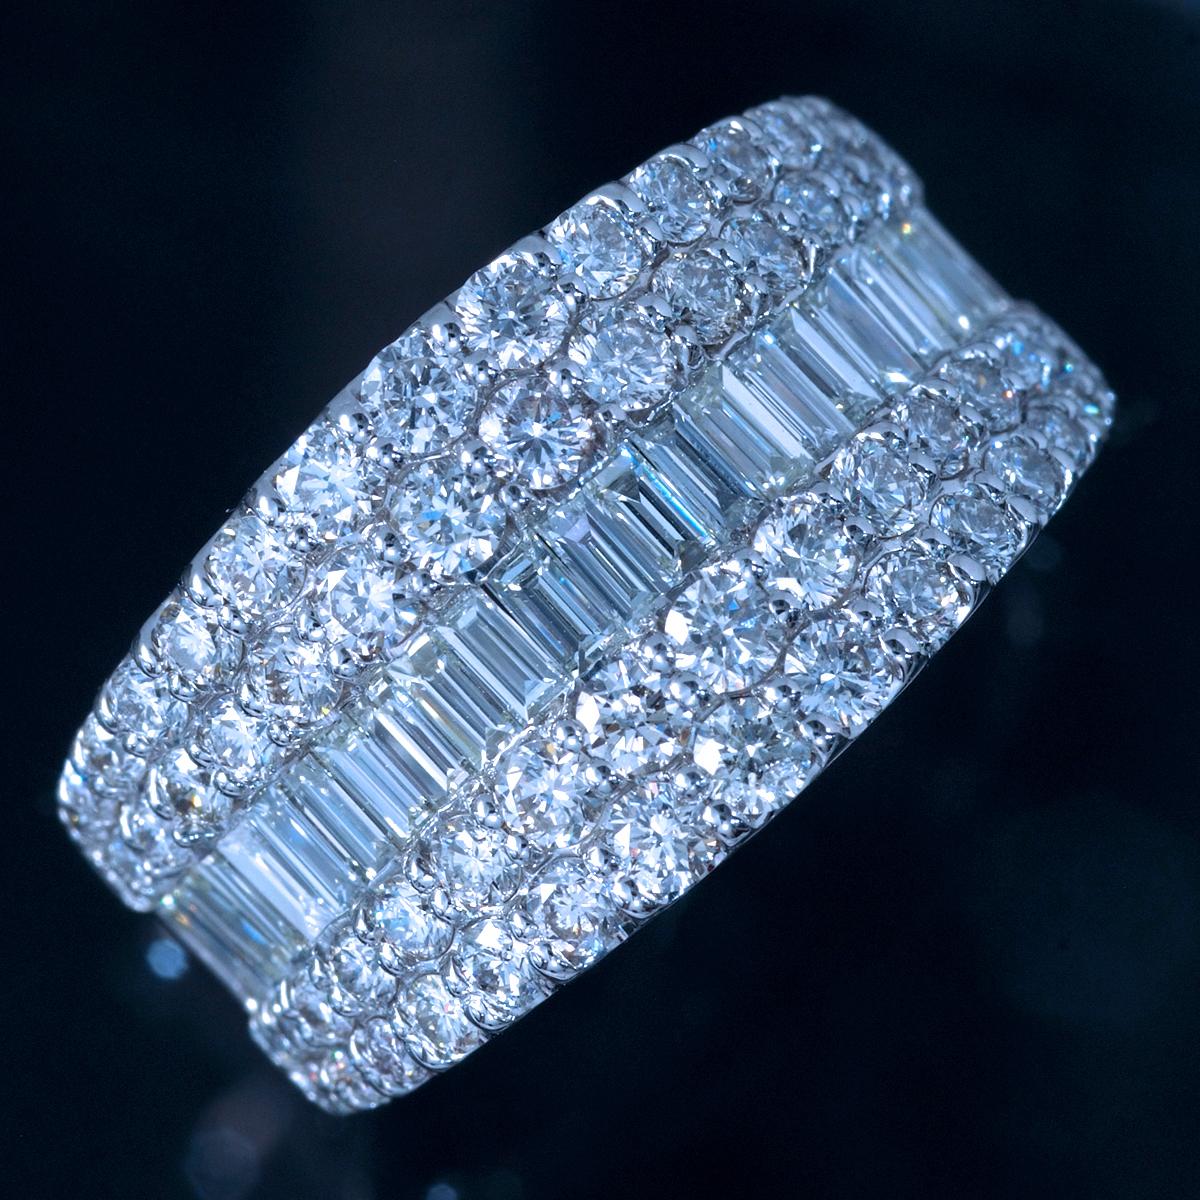 *R4494 新品!業者向け令和新作モデル!天然上質ダイヤモンド2.00ct 最高級Pt900無垢セレブリティリング